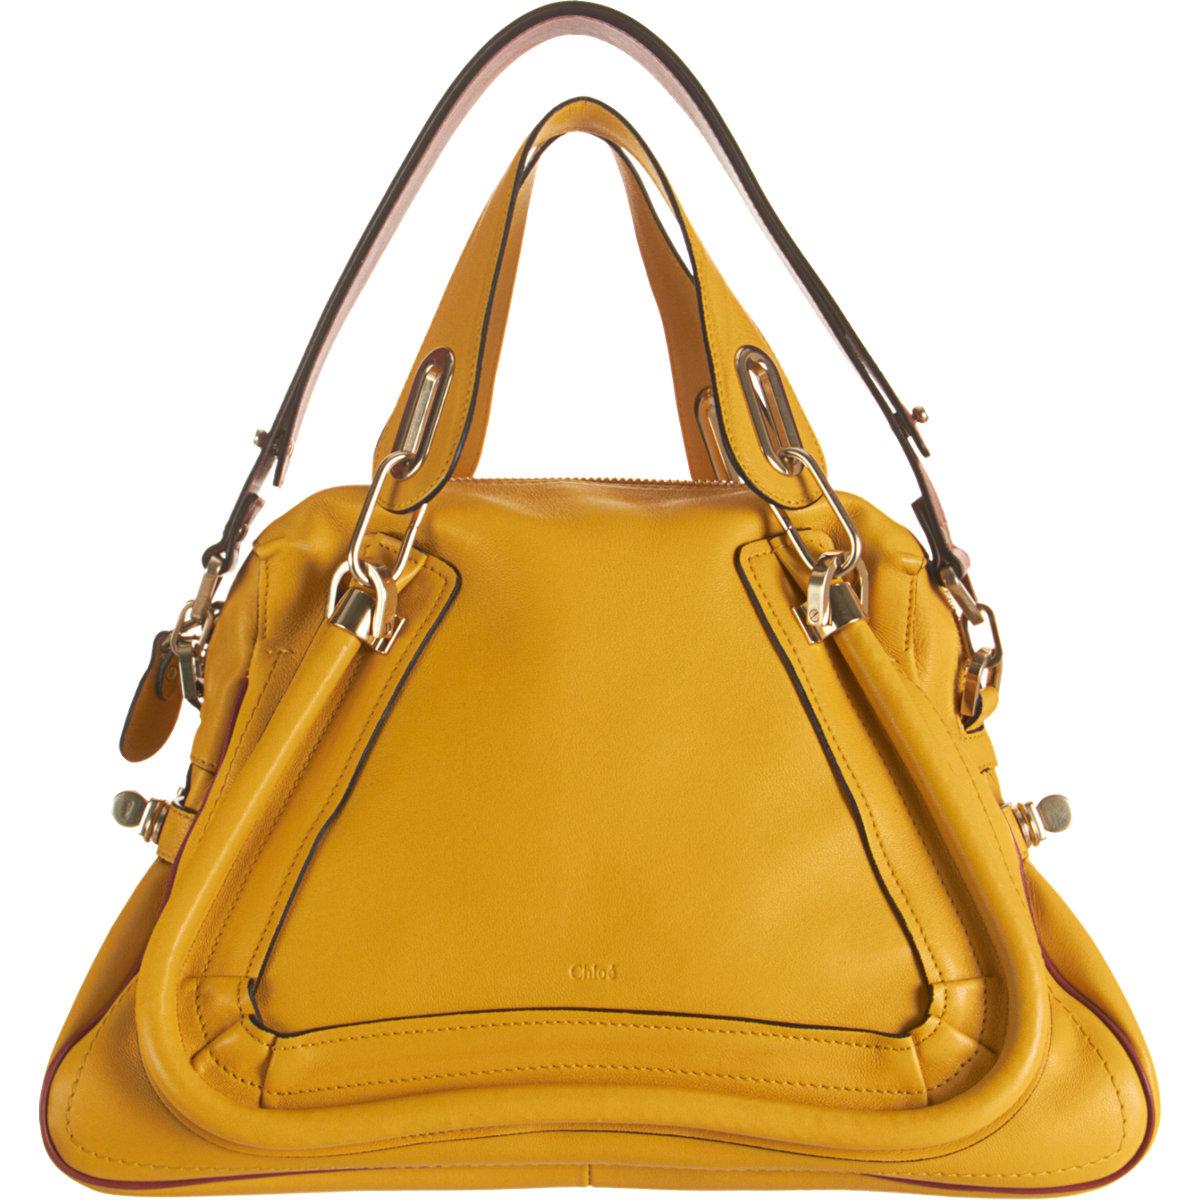 Chlo¨¦ Colorblock Medium Paraty Satchel in Yellow (gold) | Lyst